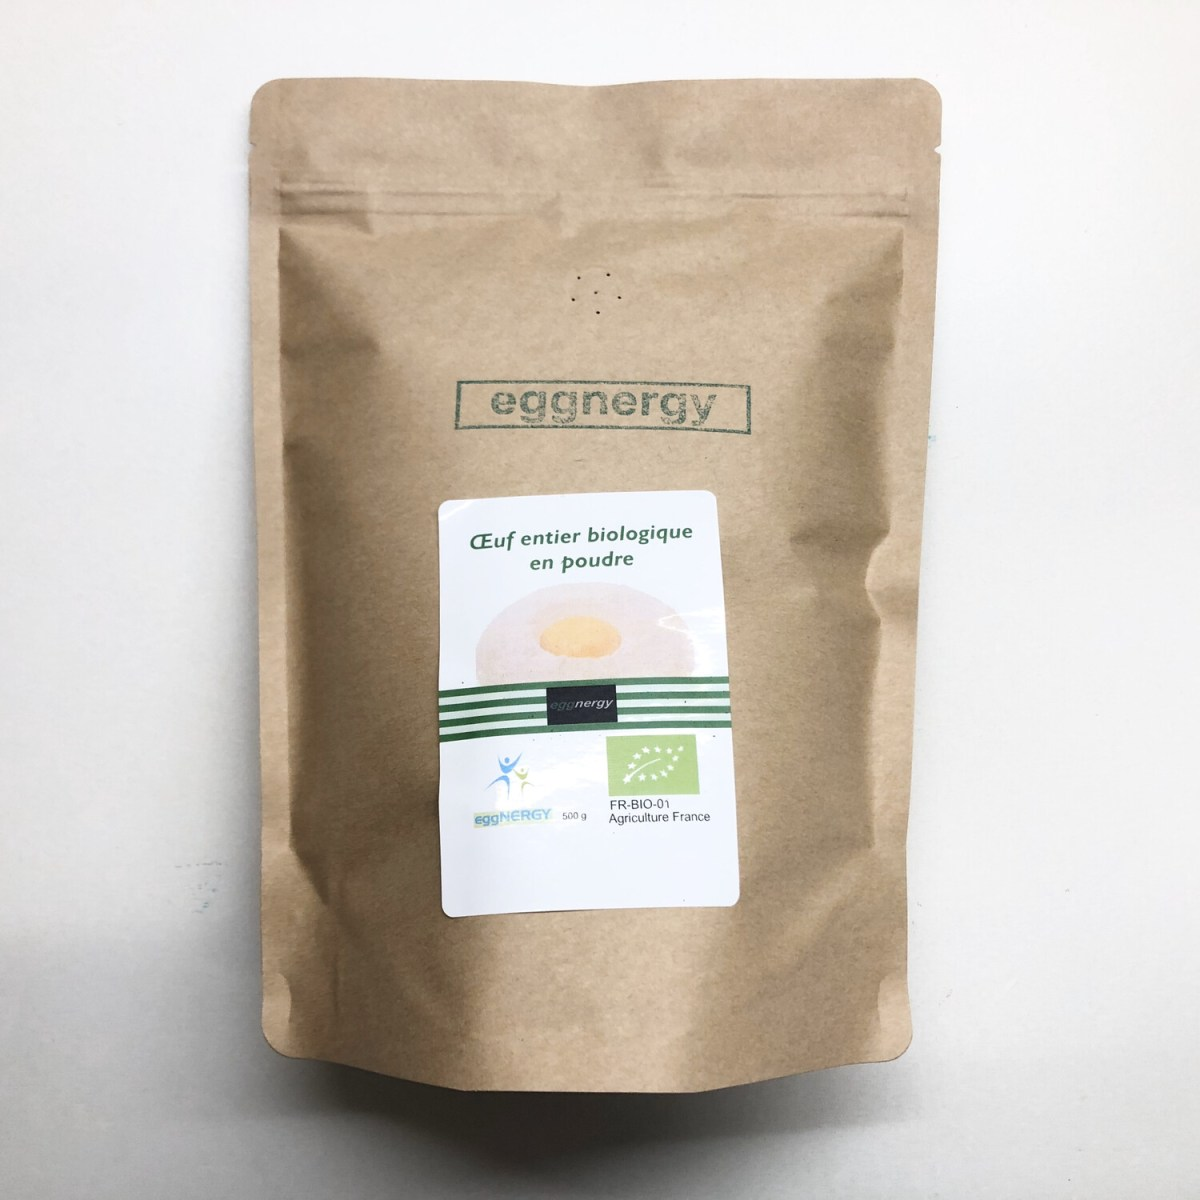 Oeuf entier bio en poudre: 1200 g